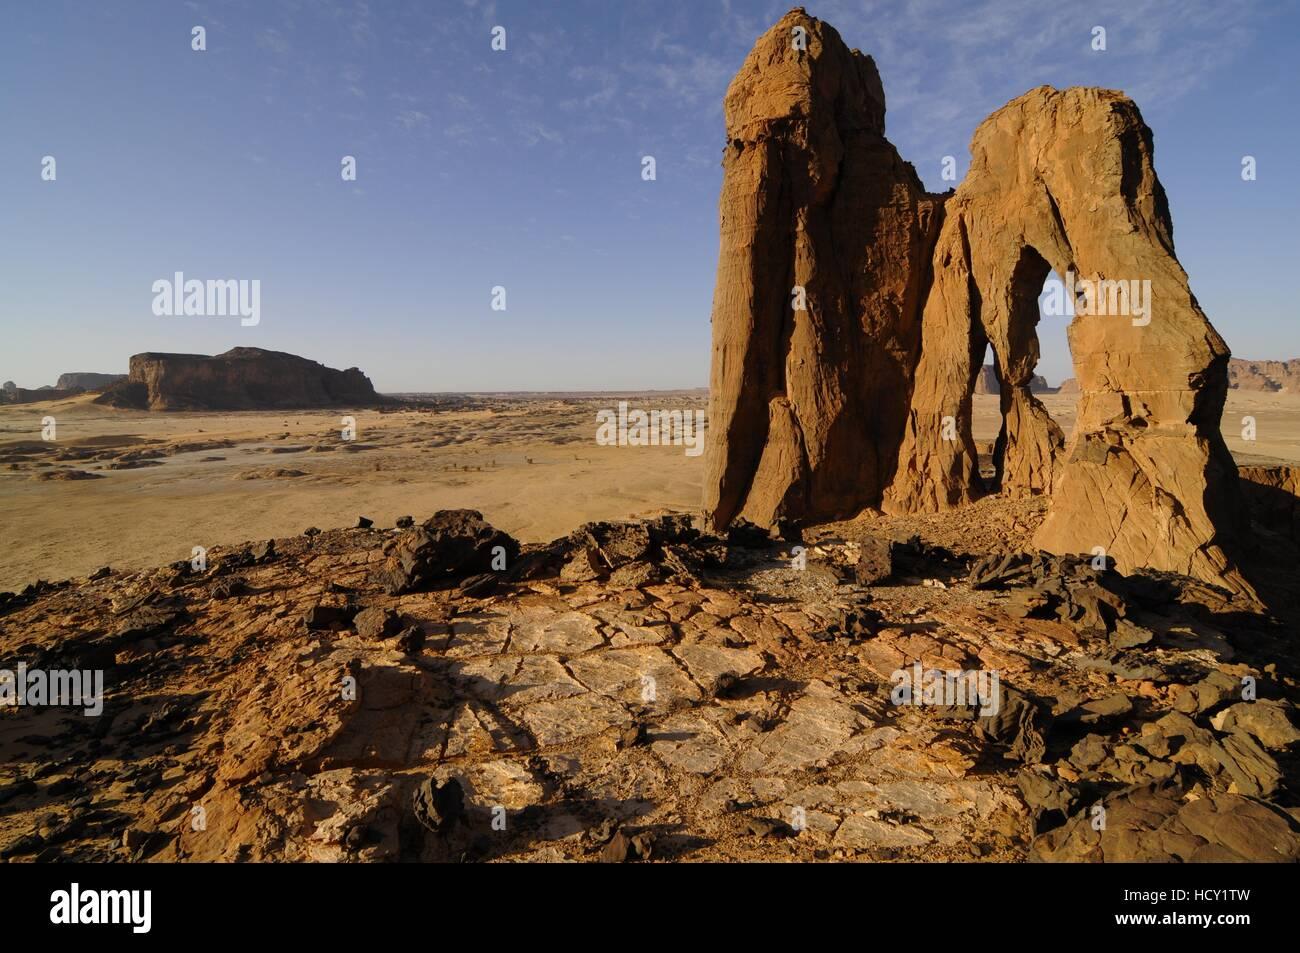 D'Anoa natural arch, Sahara desert, Ennedi, Chad, Africa - Stock Image